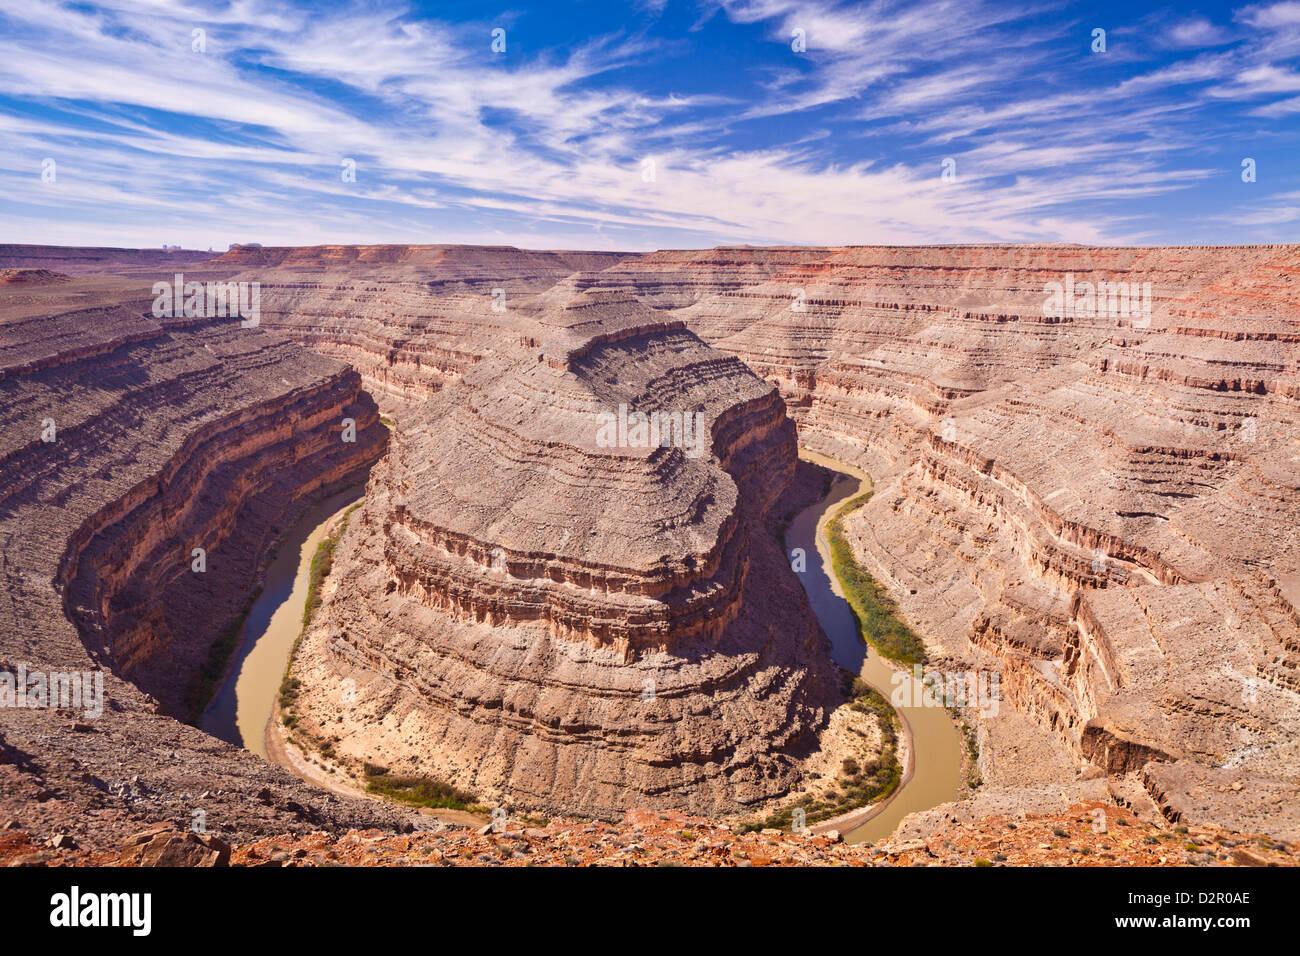 San Juan River, Goosenecks State Park, Utah, United States of America, North America - Stock Image